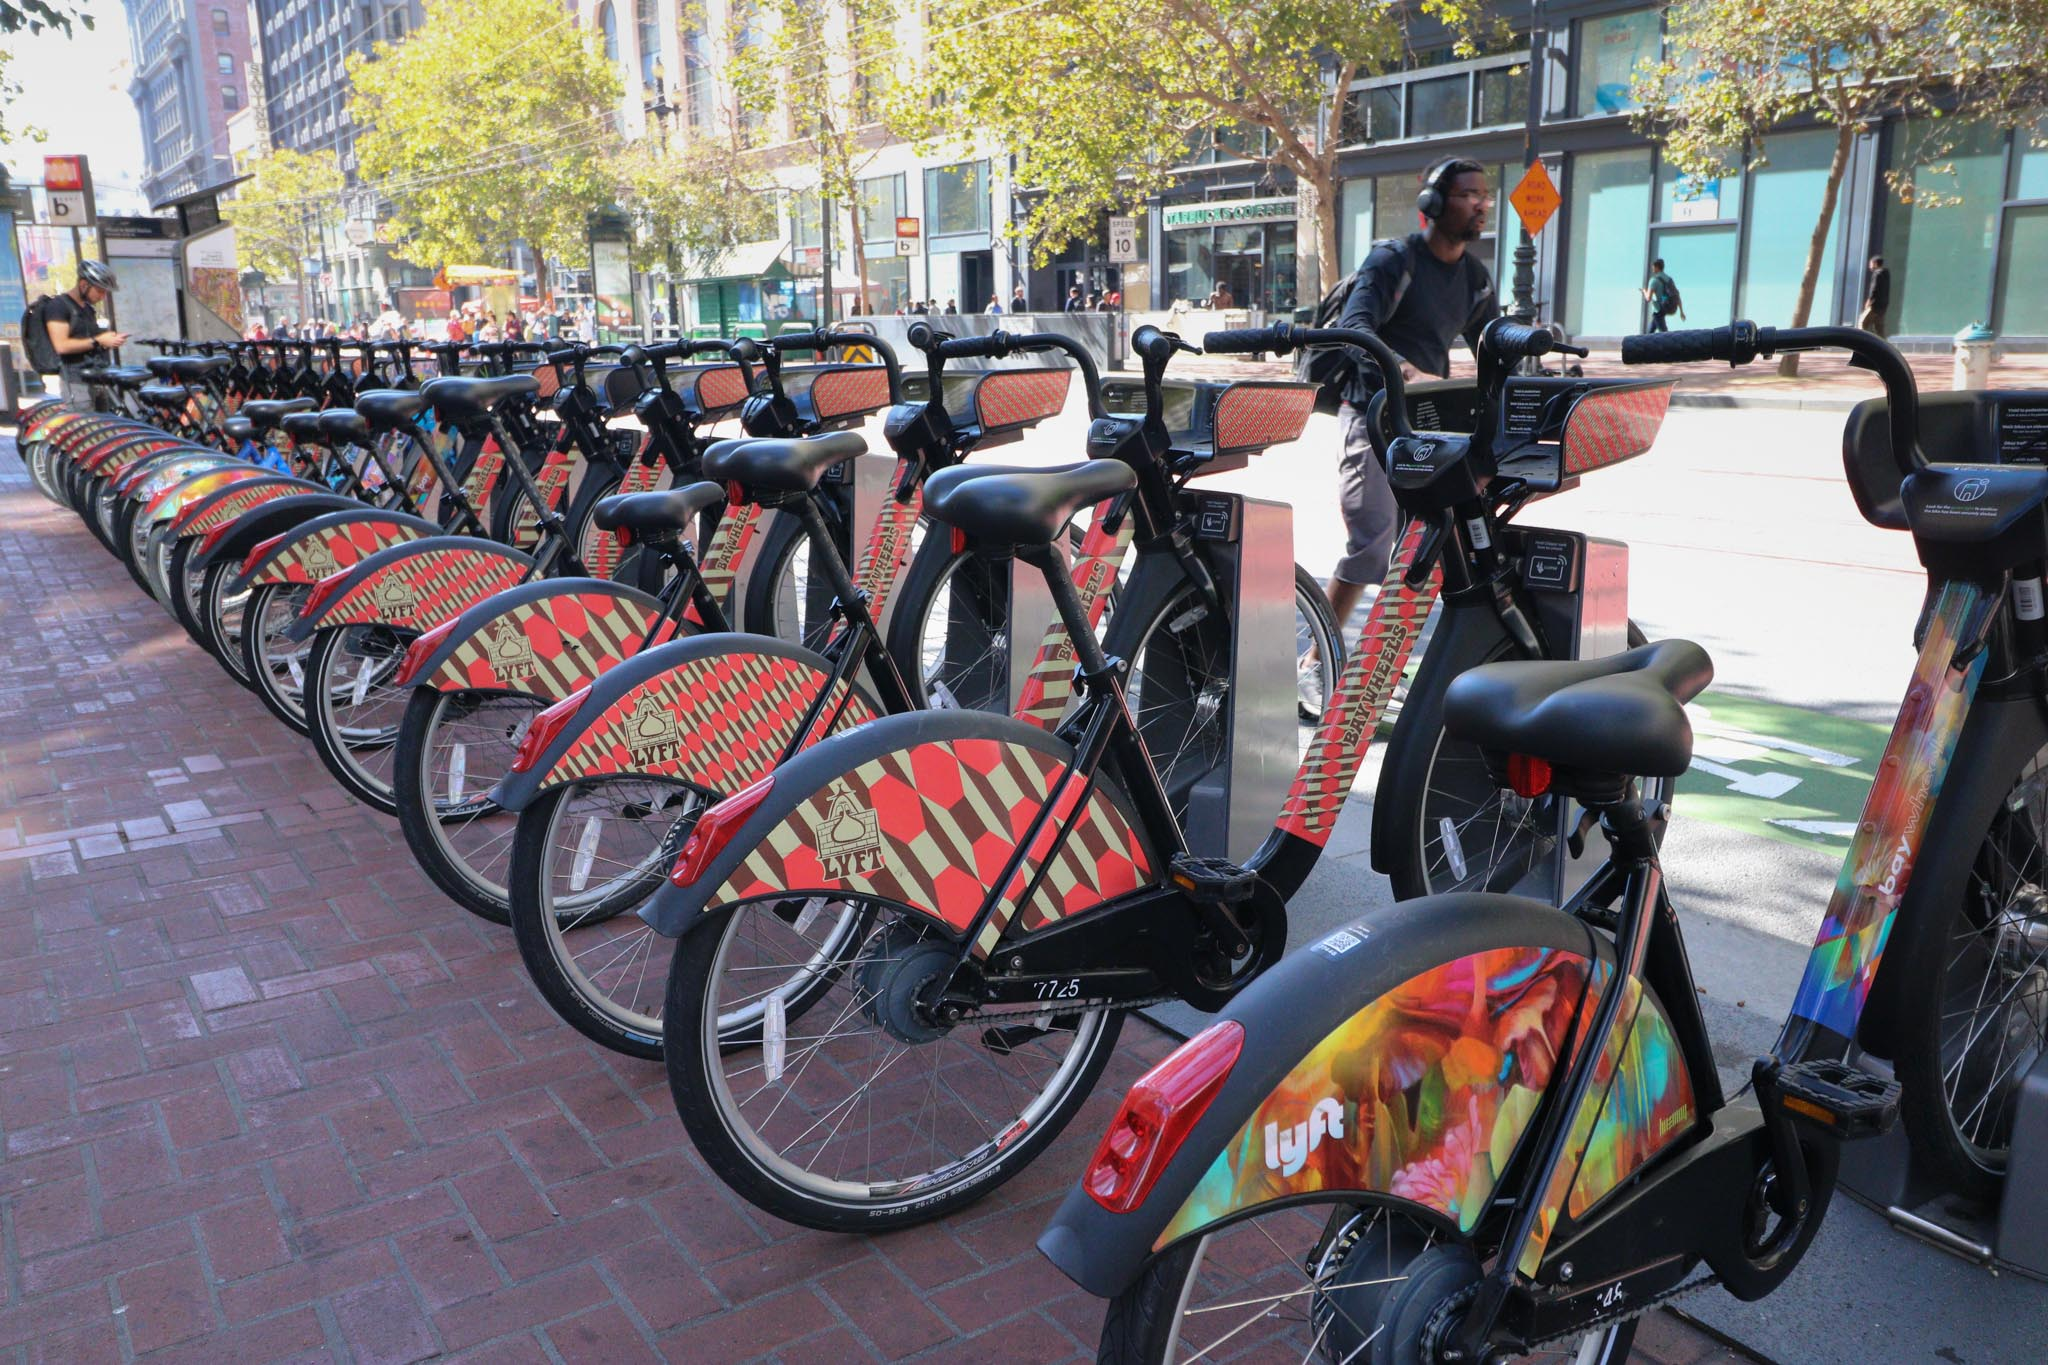 TravelTech: Urban Mobility